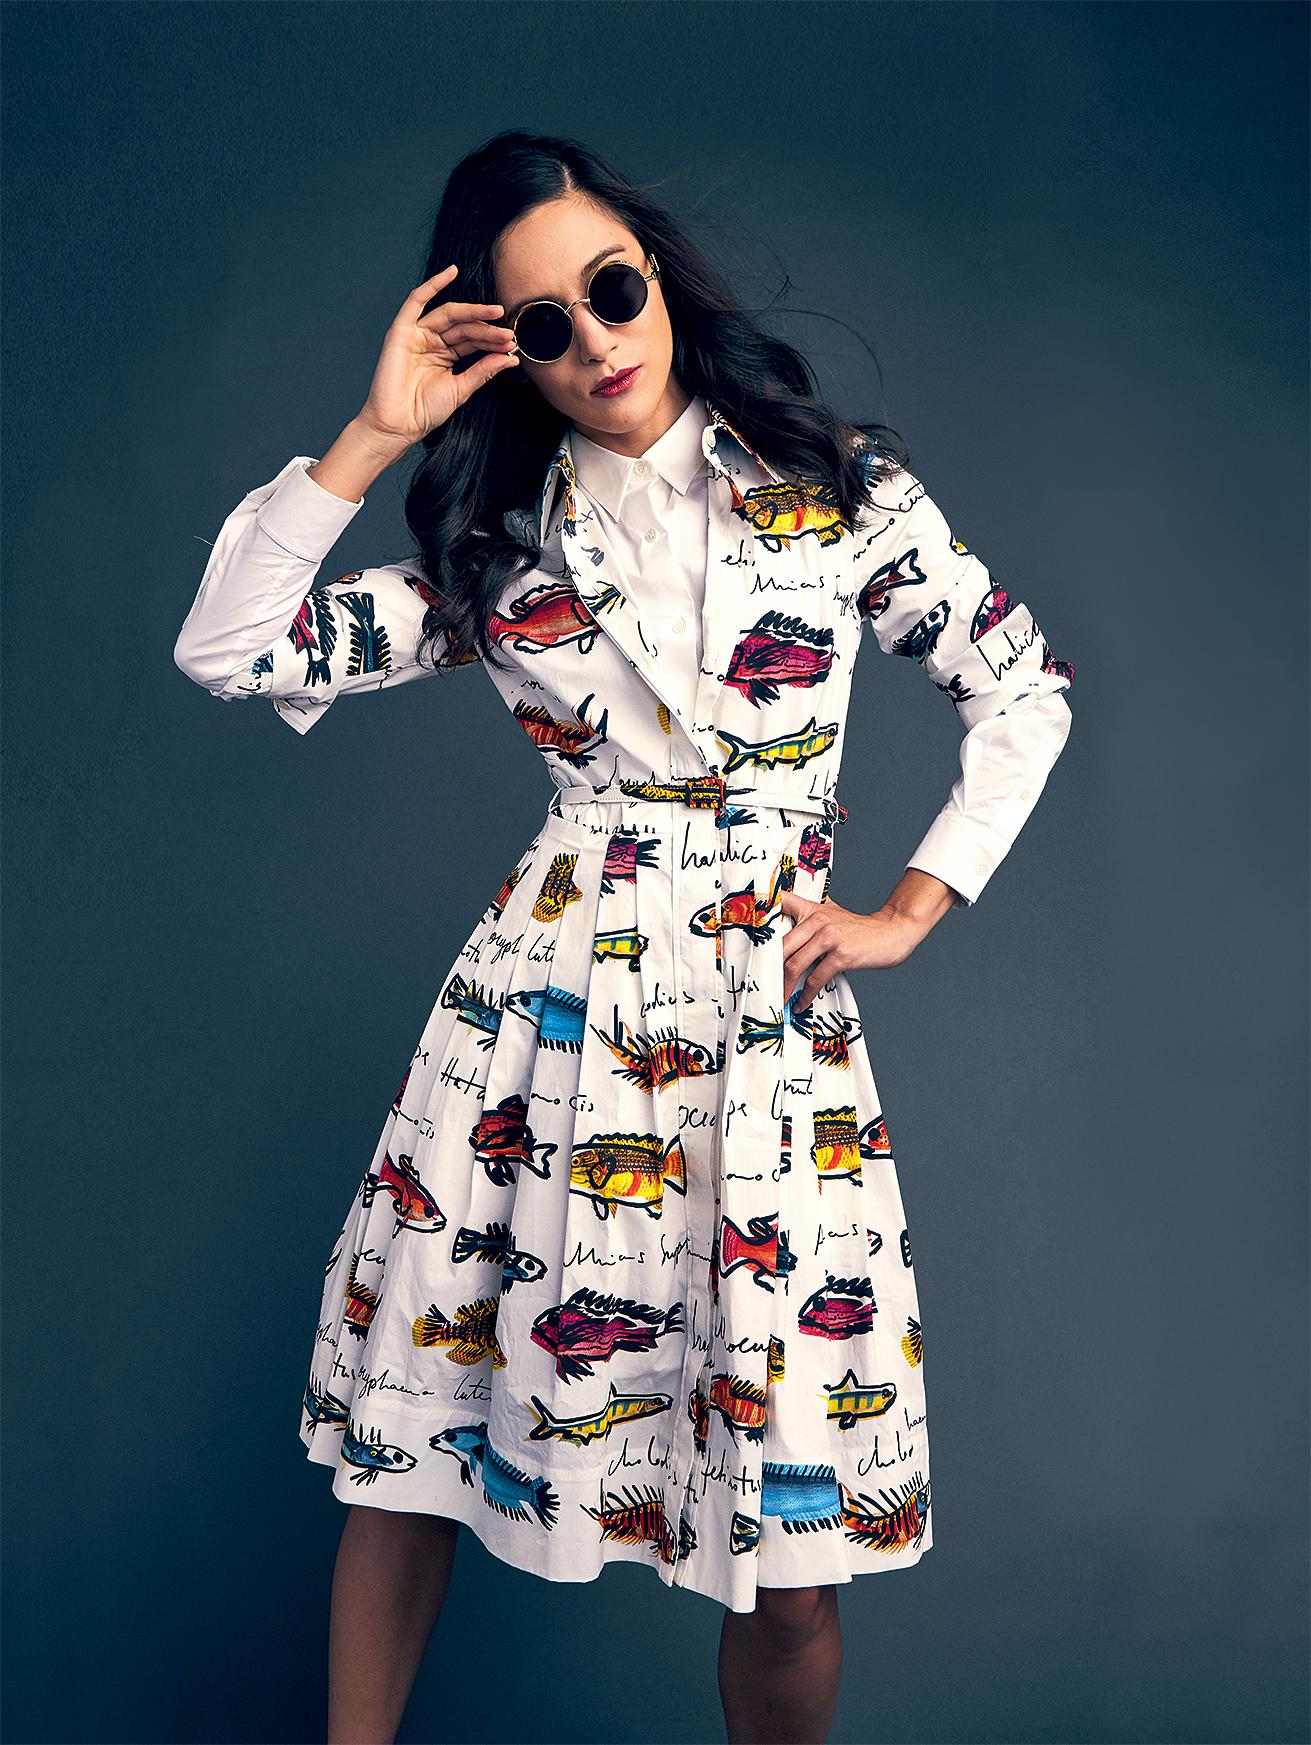 White shirt, $140 at Club Monaco; Oscar de la Renta fish-print dress, $2,190 at Saks; Le Spec sunglasses, $59 at Urban Outfitters.